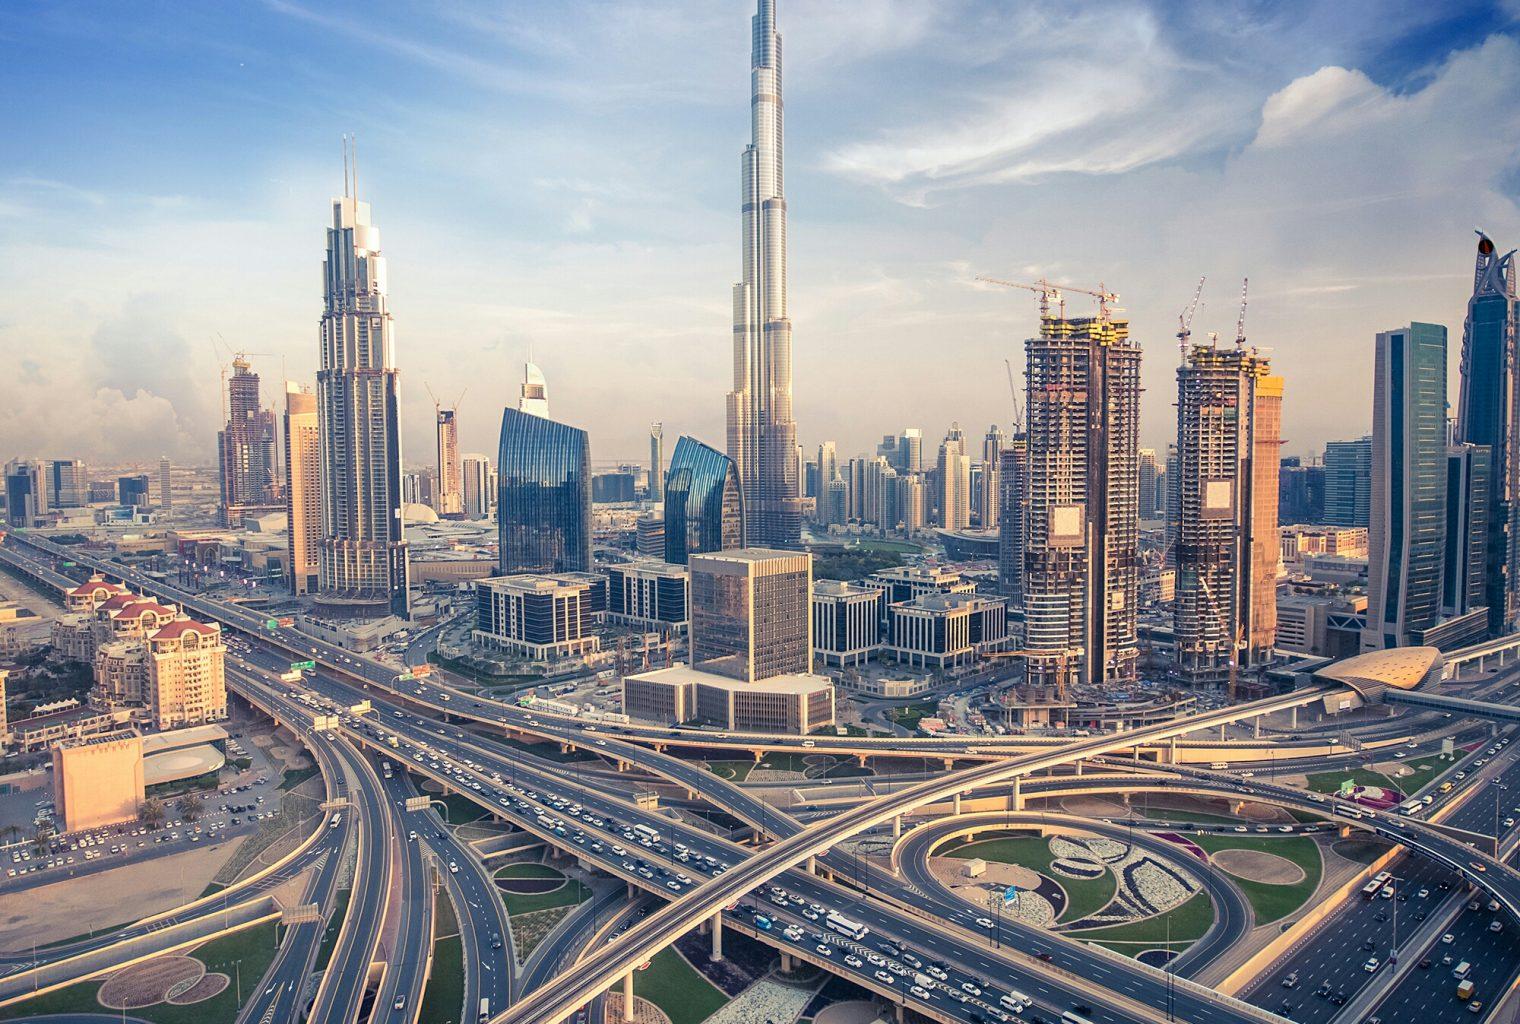 9-day Eid Ul Fitr holiday announced in UAE for public sector